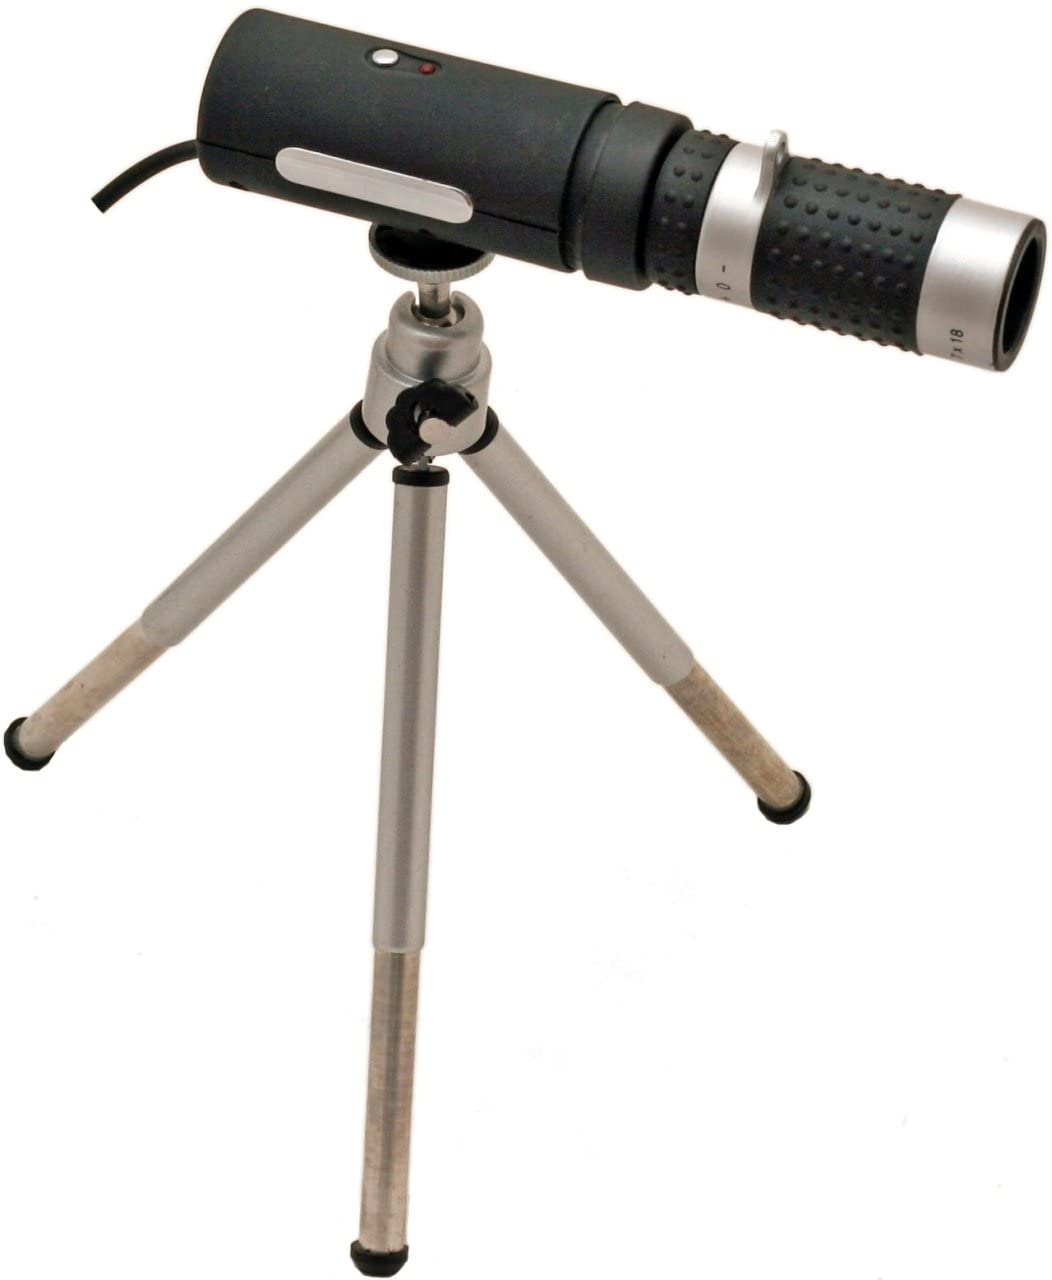 Cyber Snipa™ Spotter Webcam